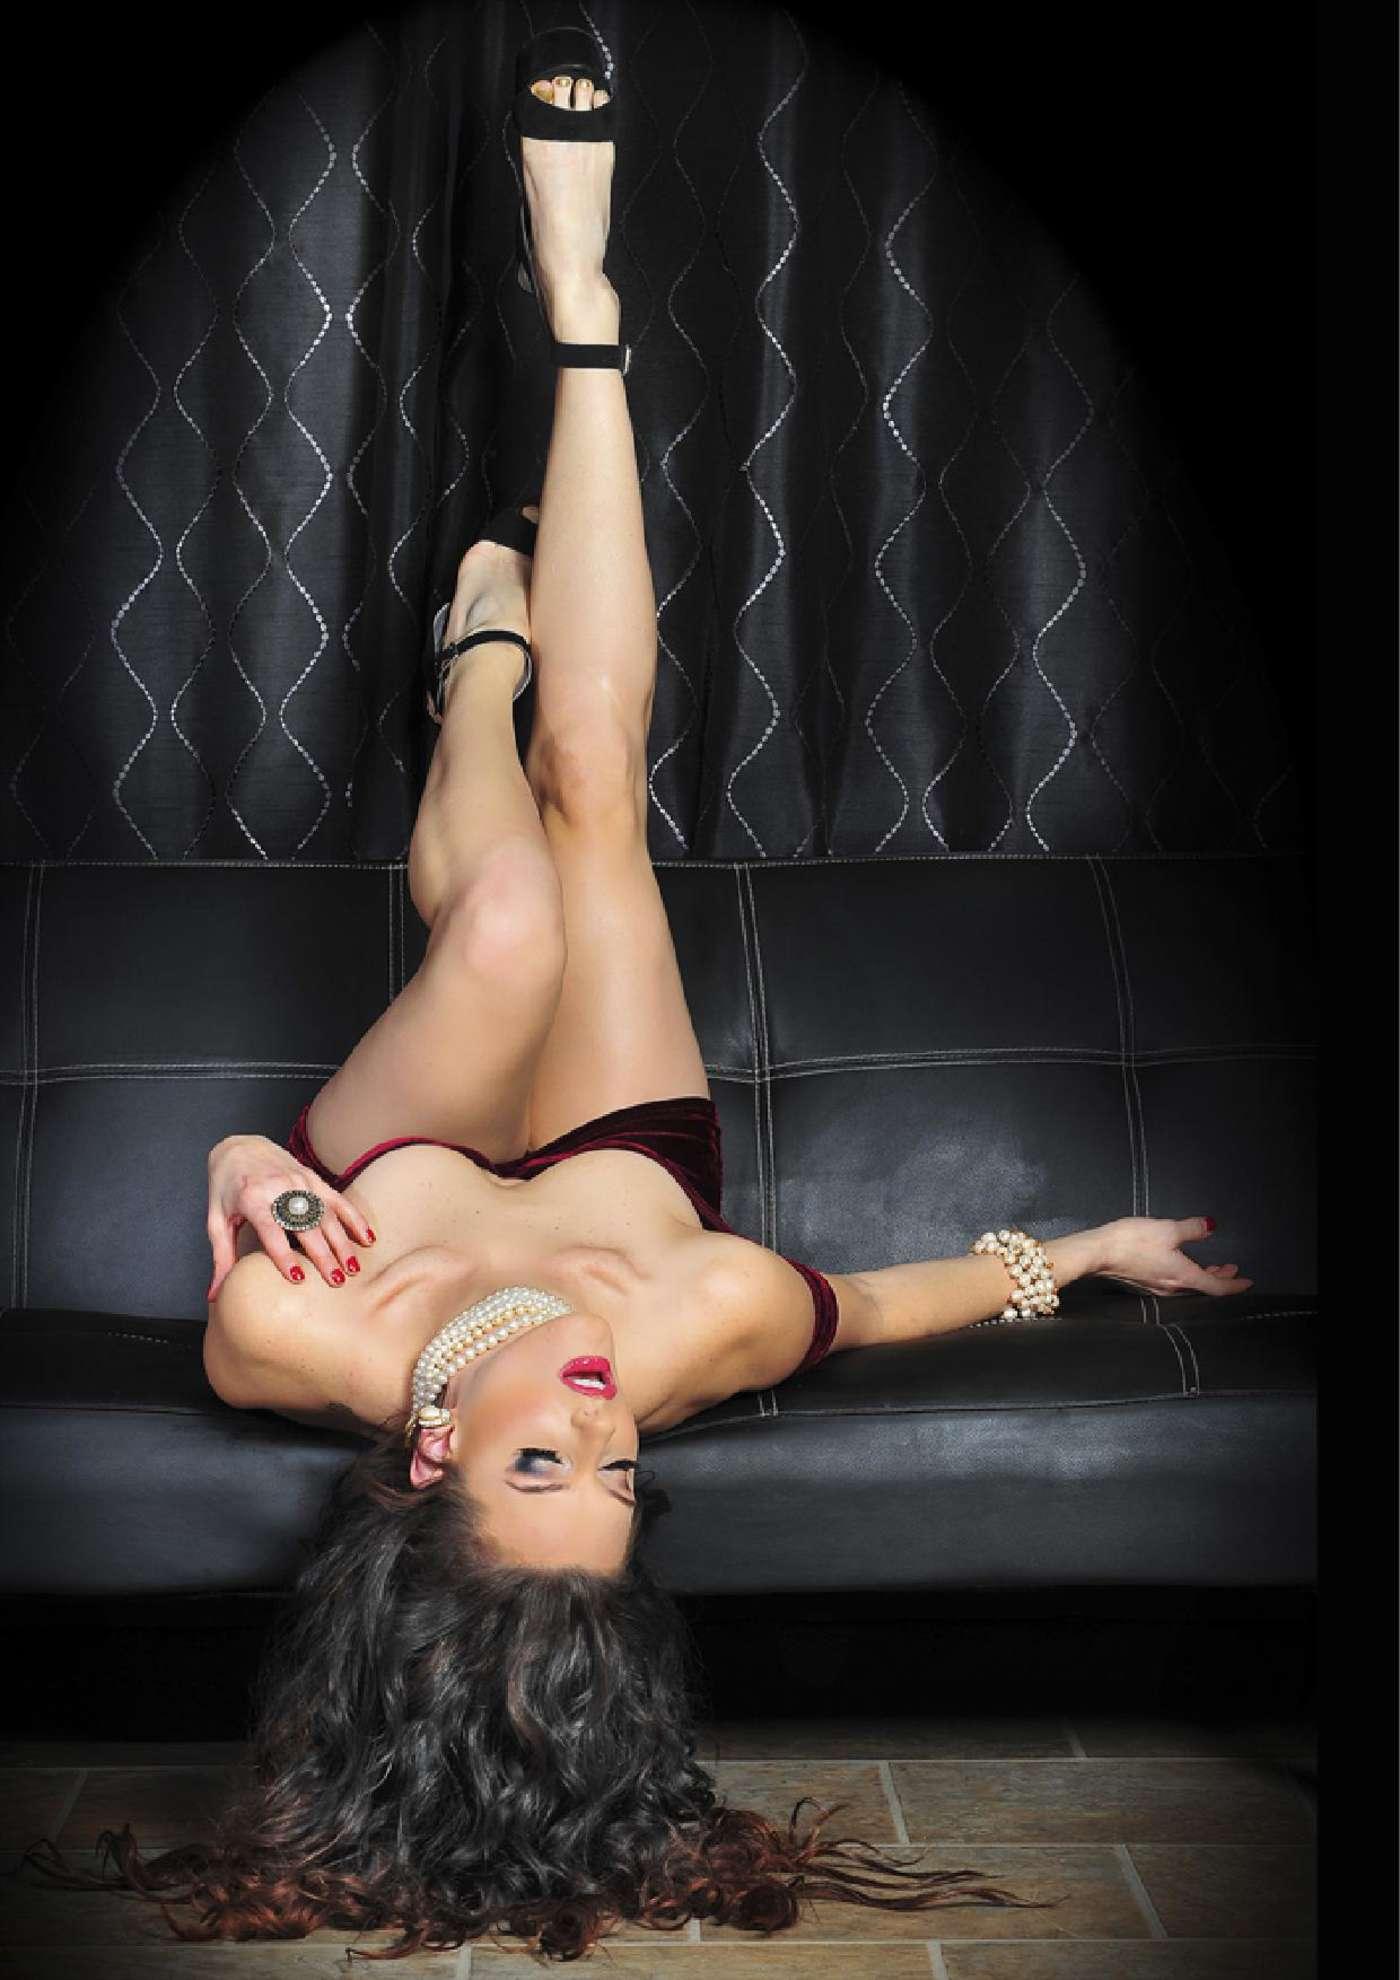 Katy perry 2014 sexy photo shoot - 1 part 10